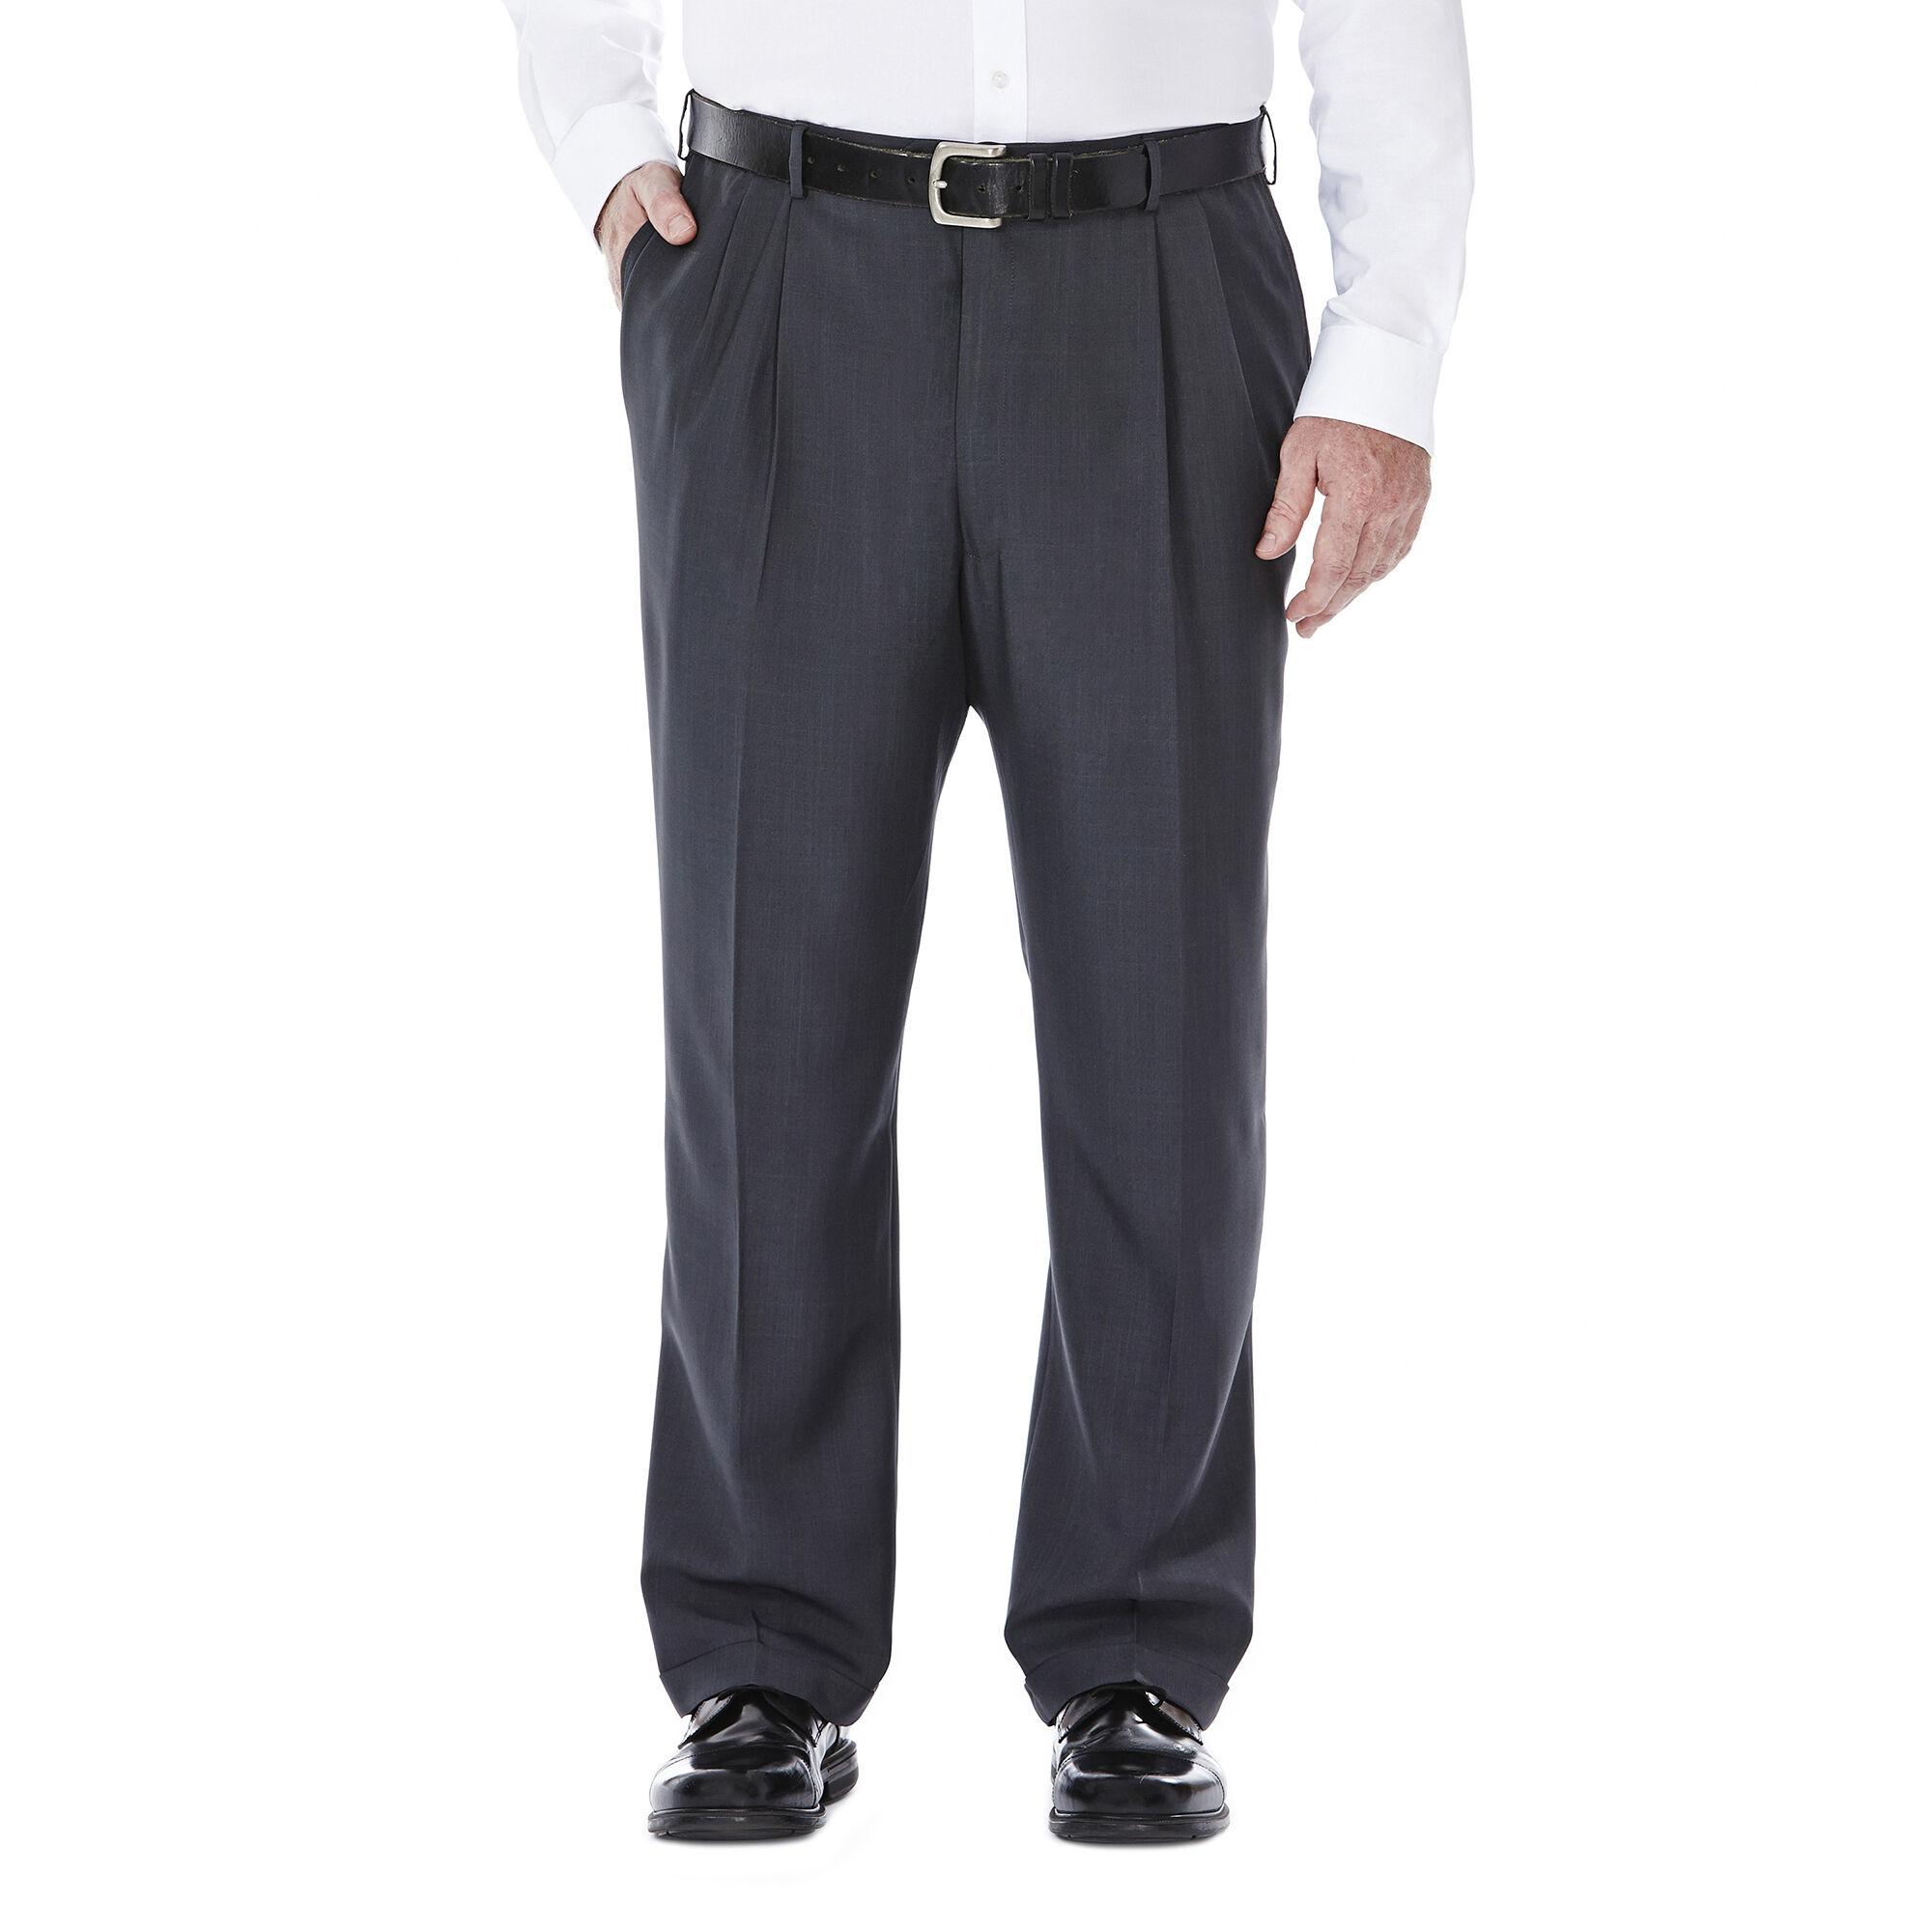 Haggar Mens eCLo Stria Expandable-Waist Pleat-Front Dress Pant